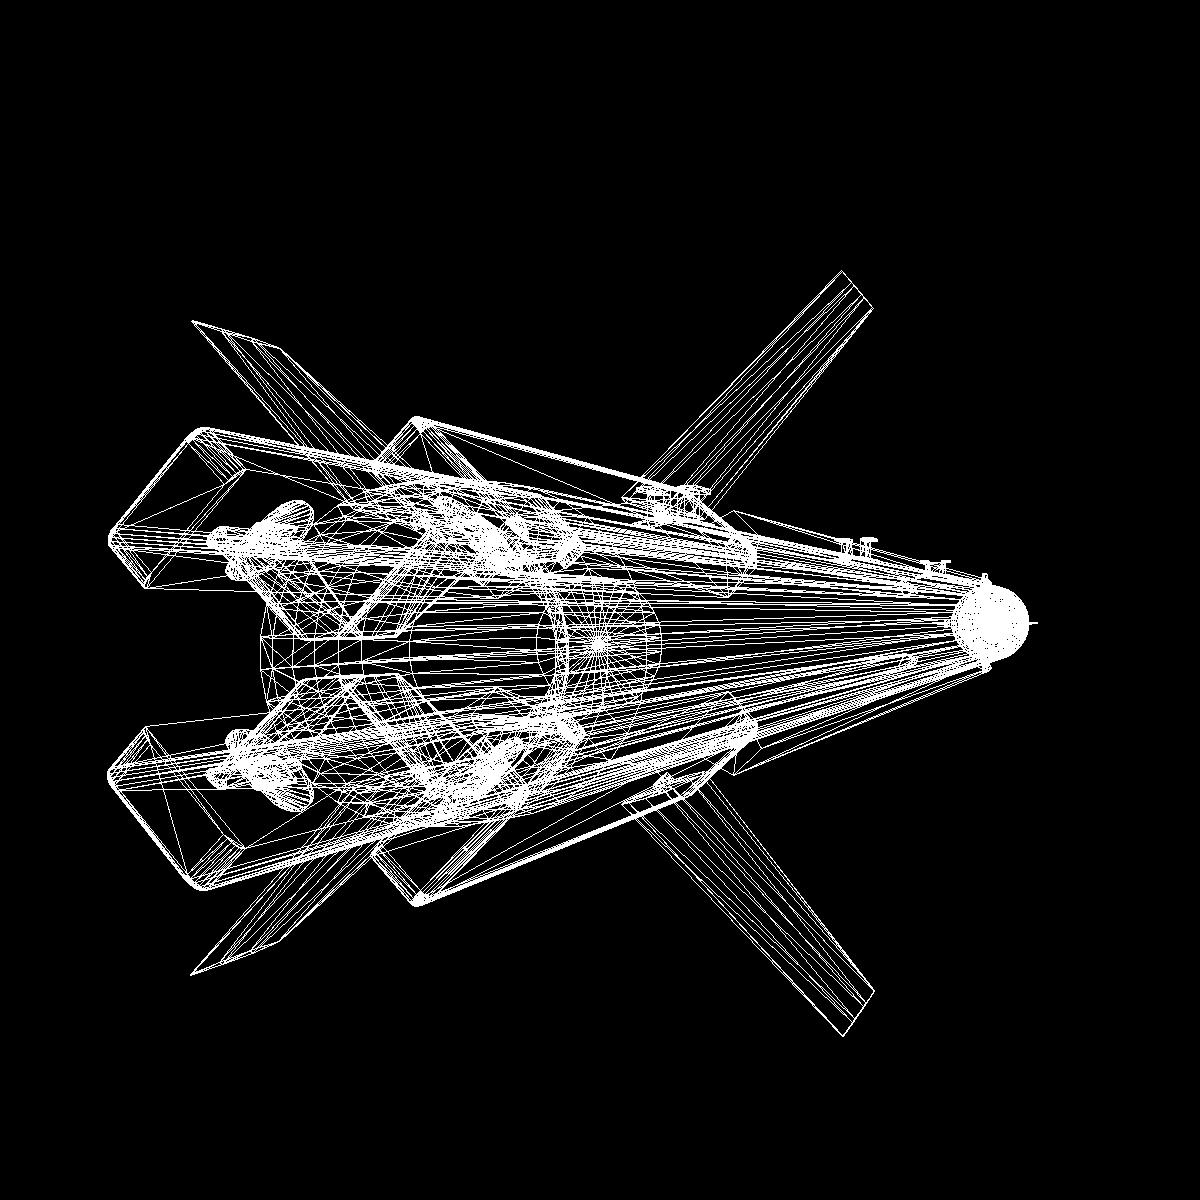 a-darter air-to-air пуужин 3d загвар 3ds dxf cob x obj 151896